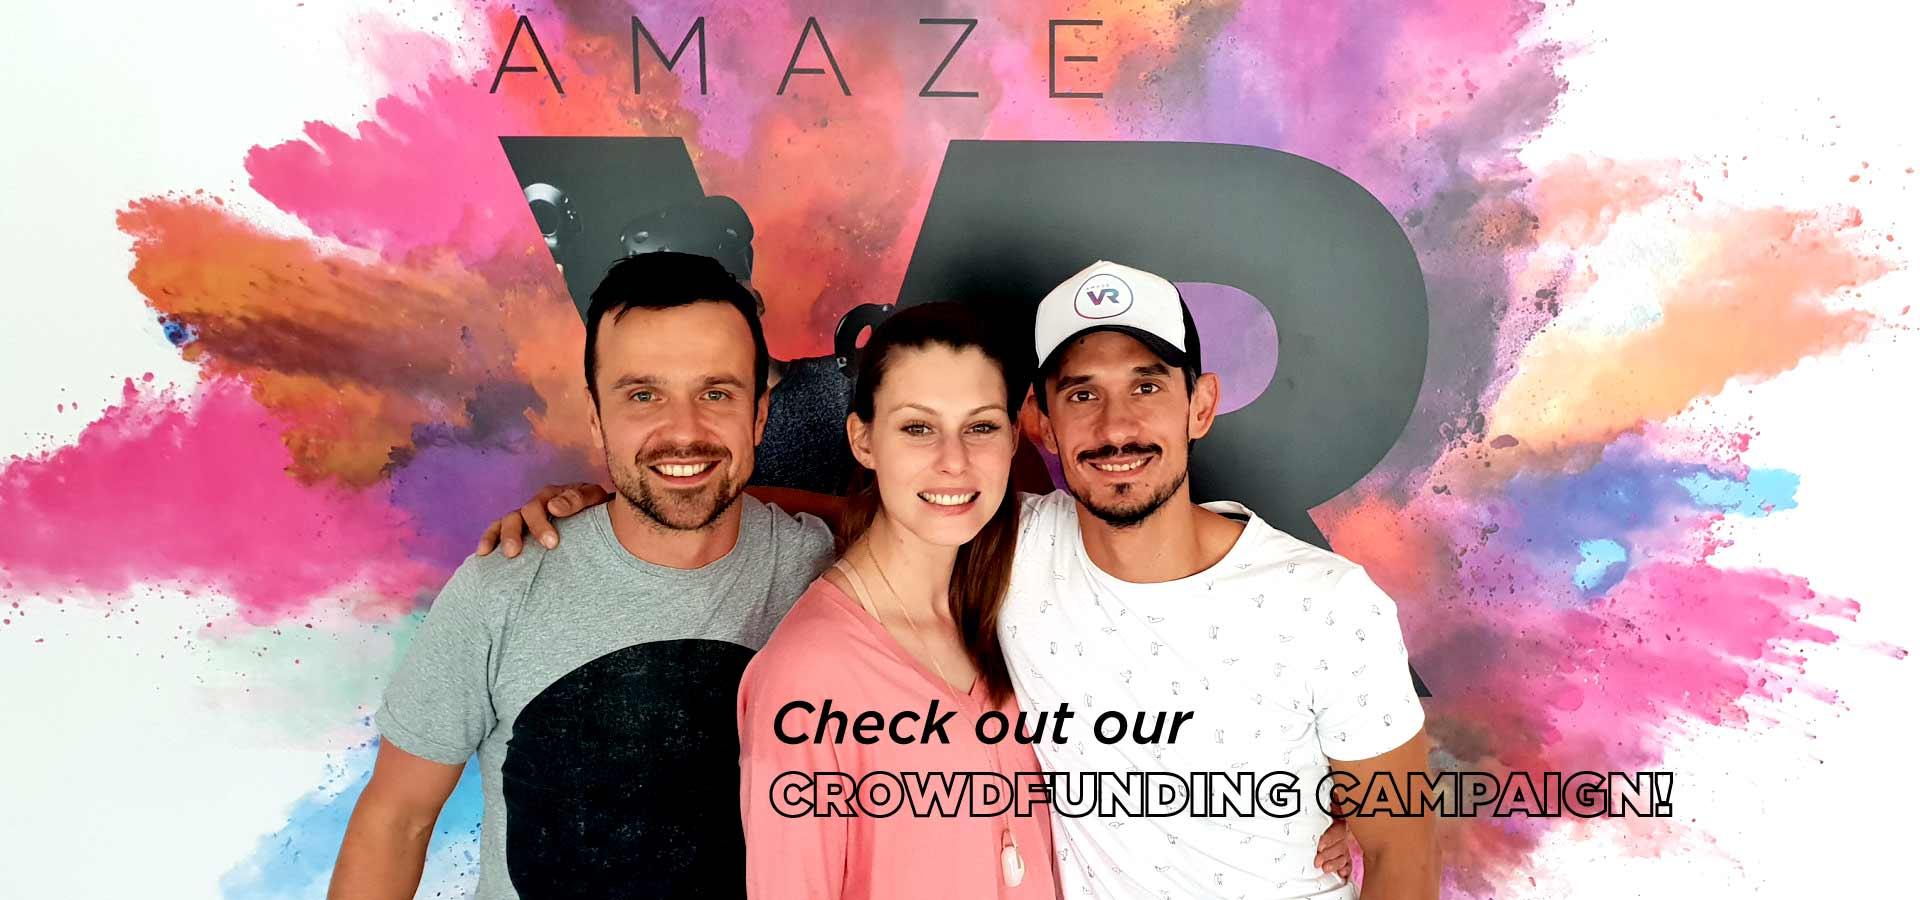 adam bea david crowdfunding amaze vr